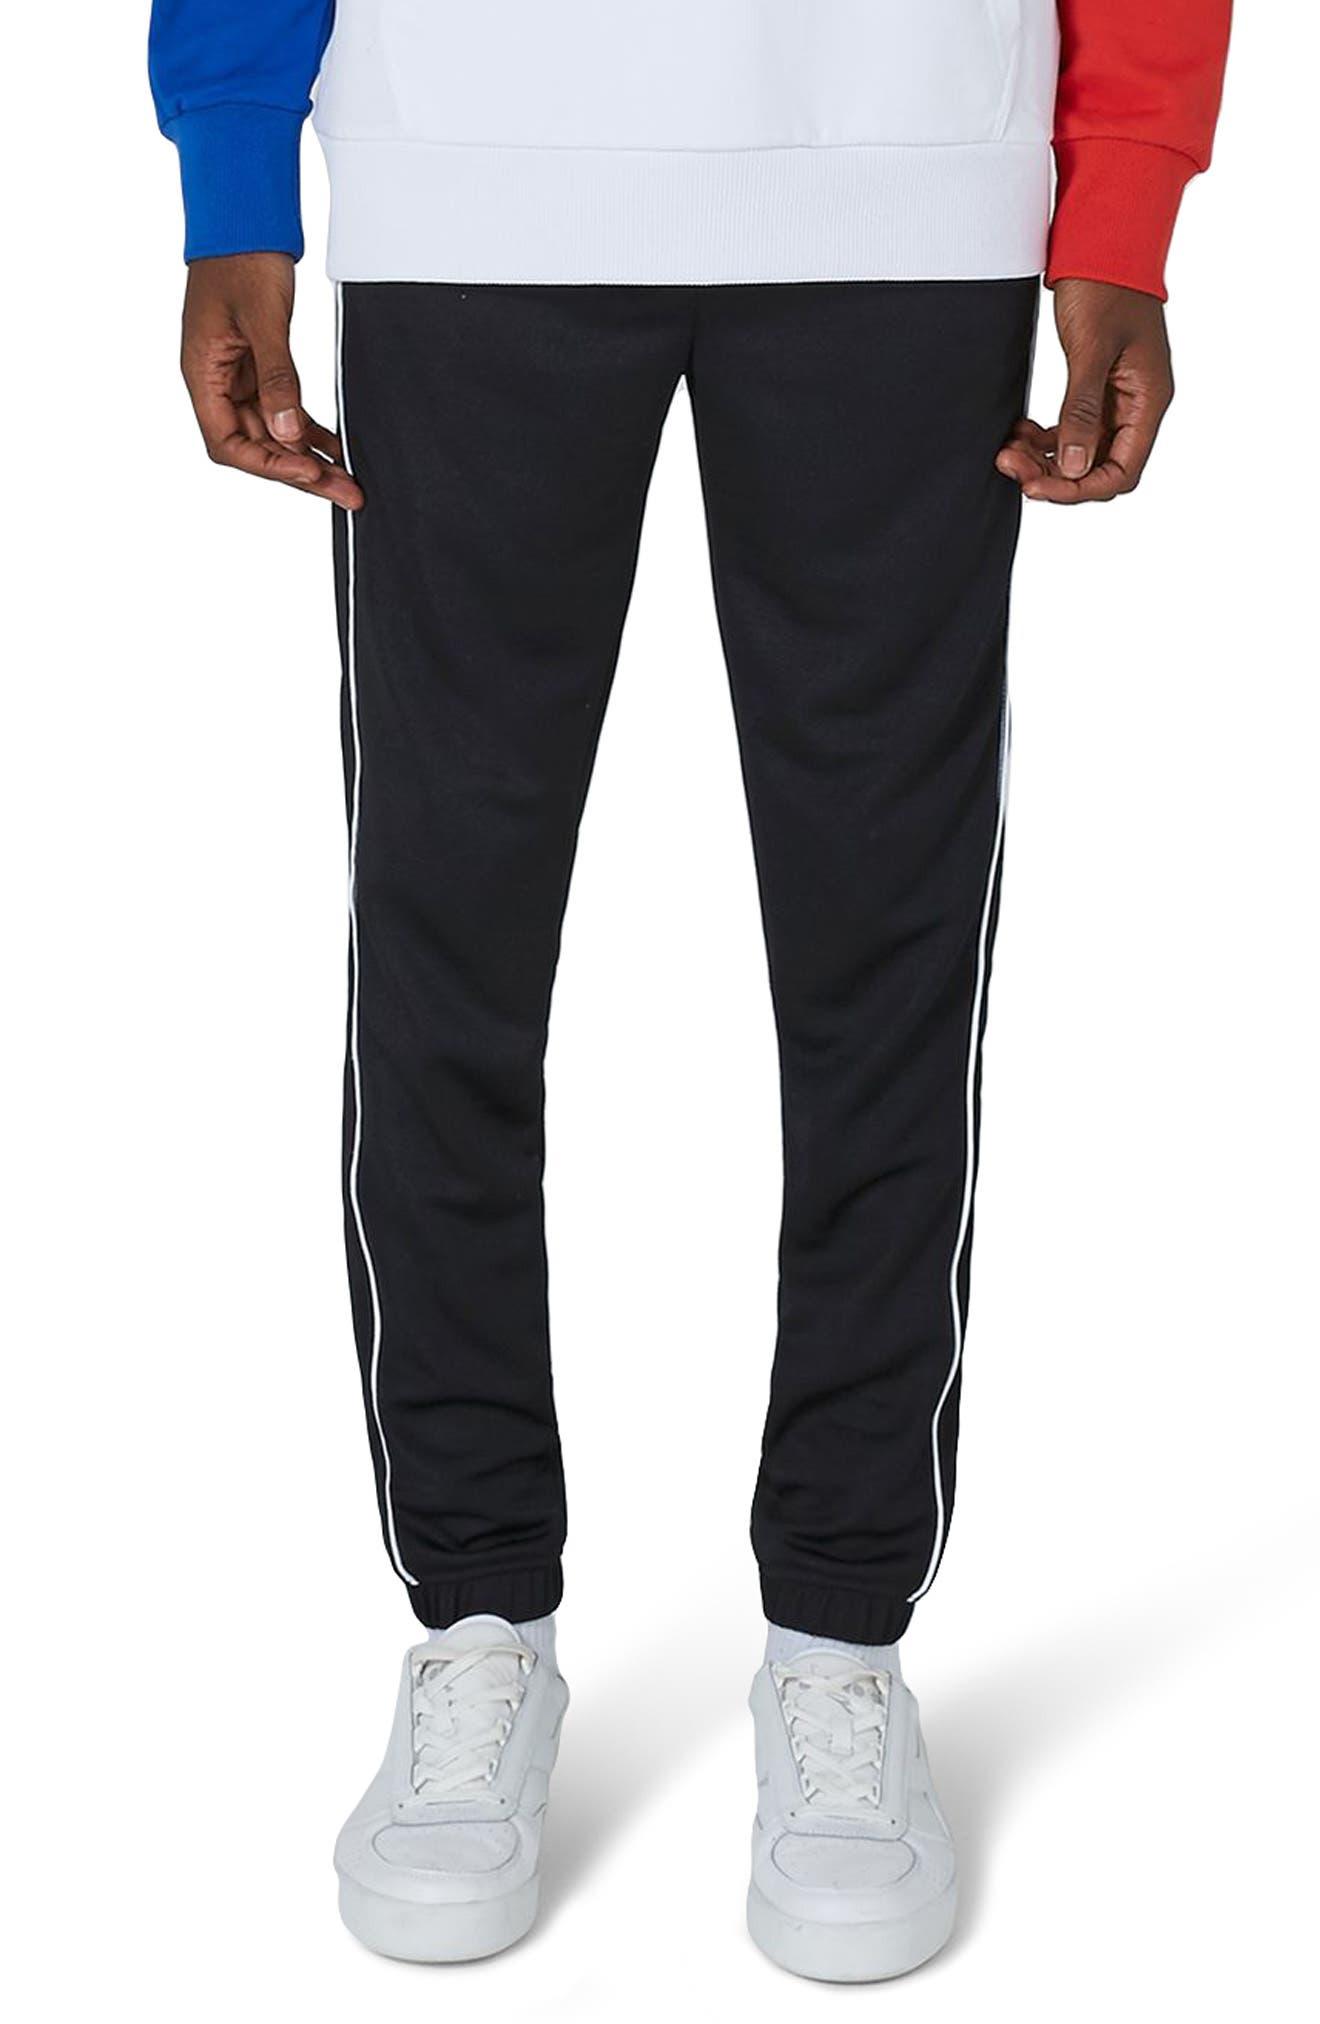 Piped Jogger Pants,                         Main,                         color, Black